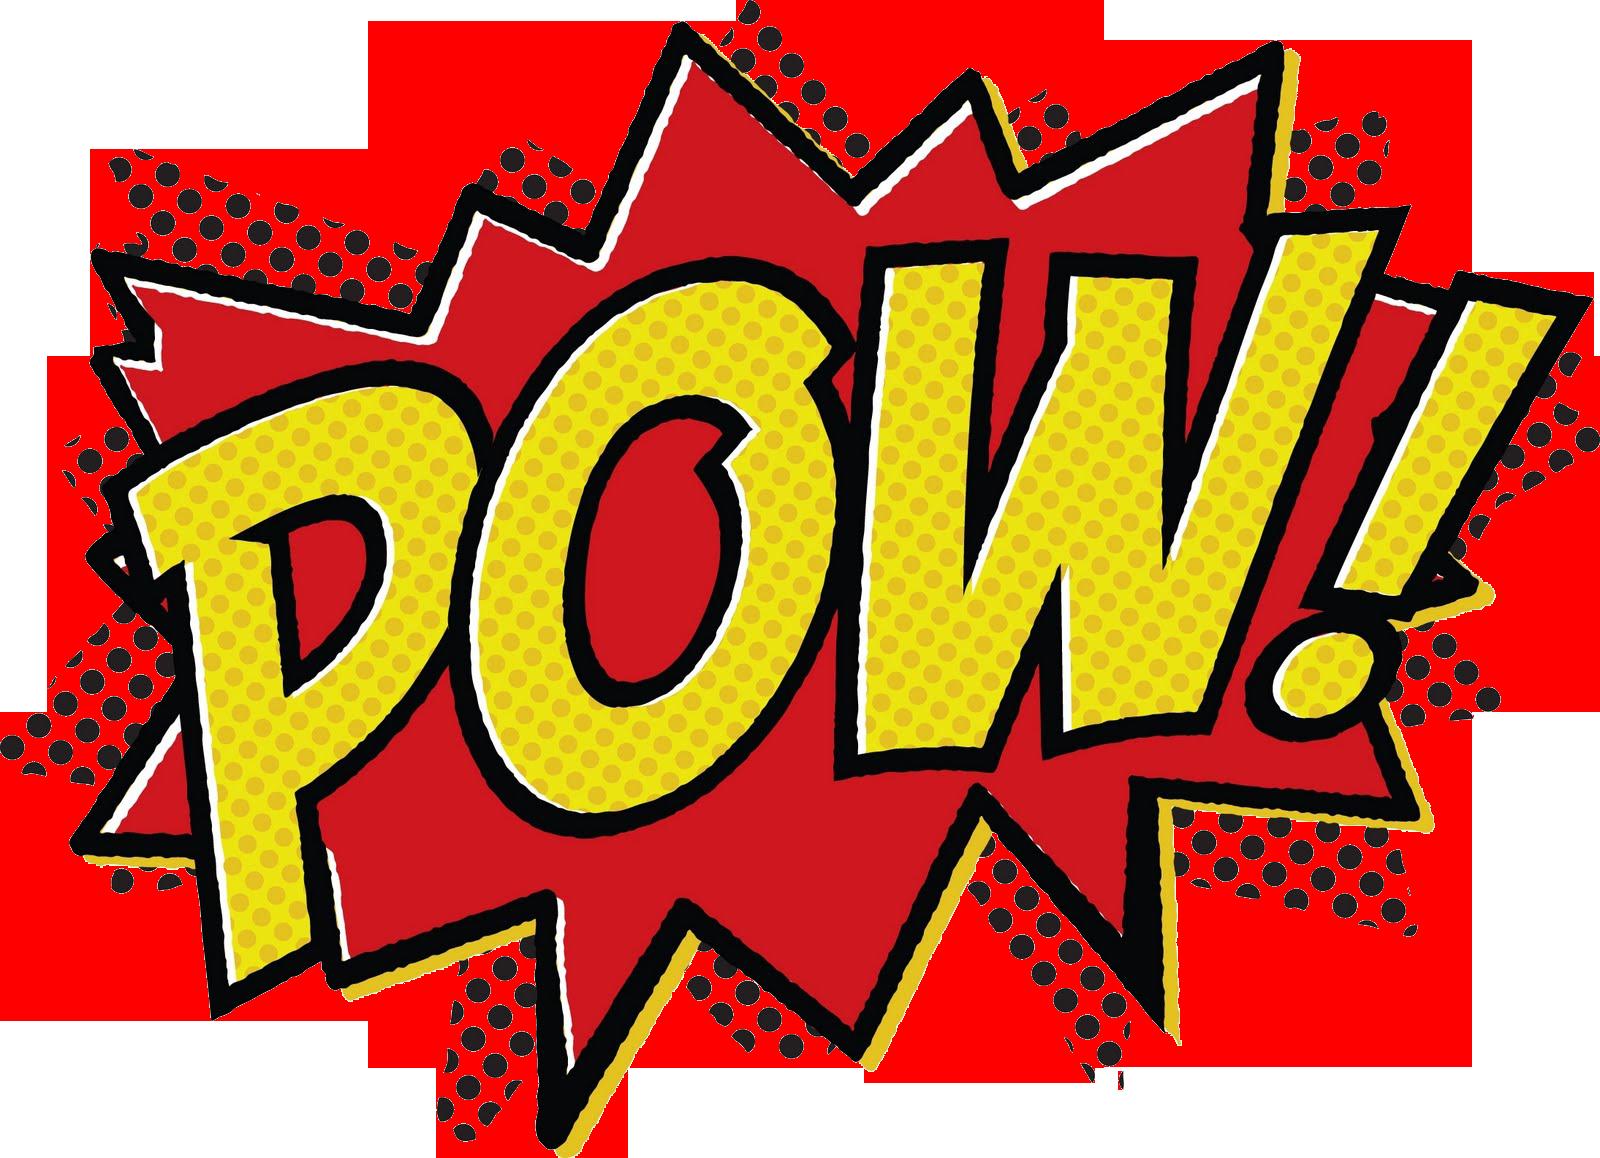 Words clipart transparent. Superheroes background superhero frames